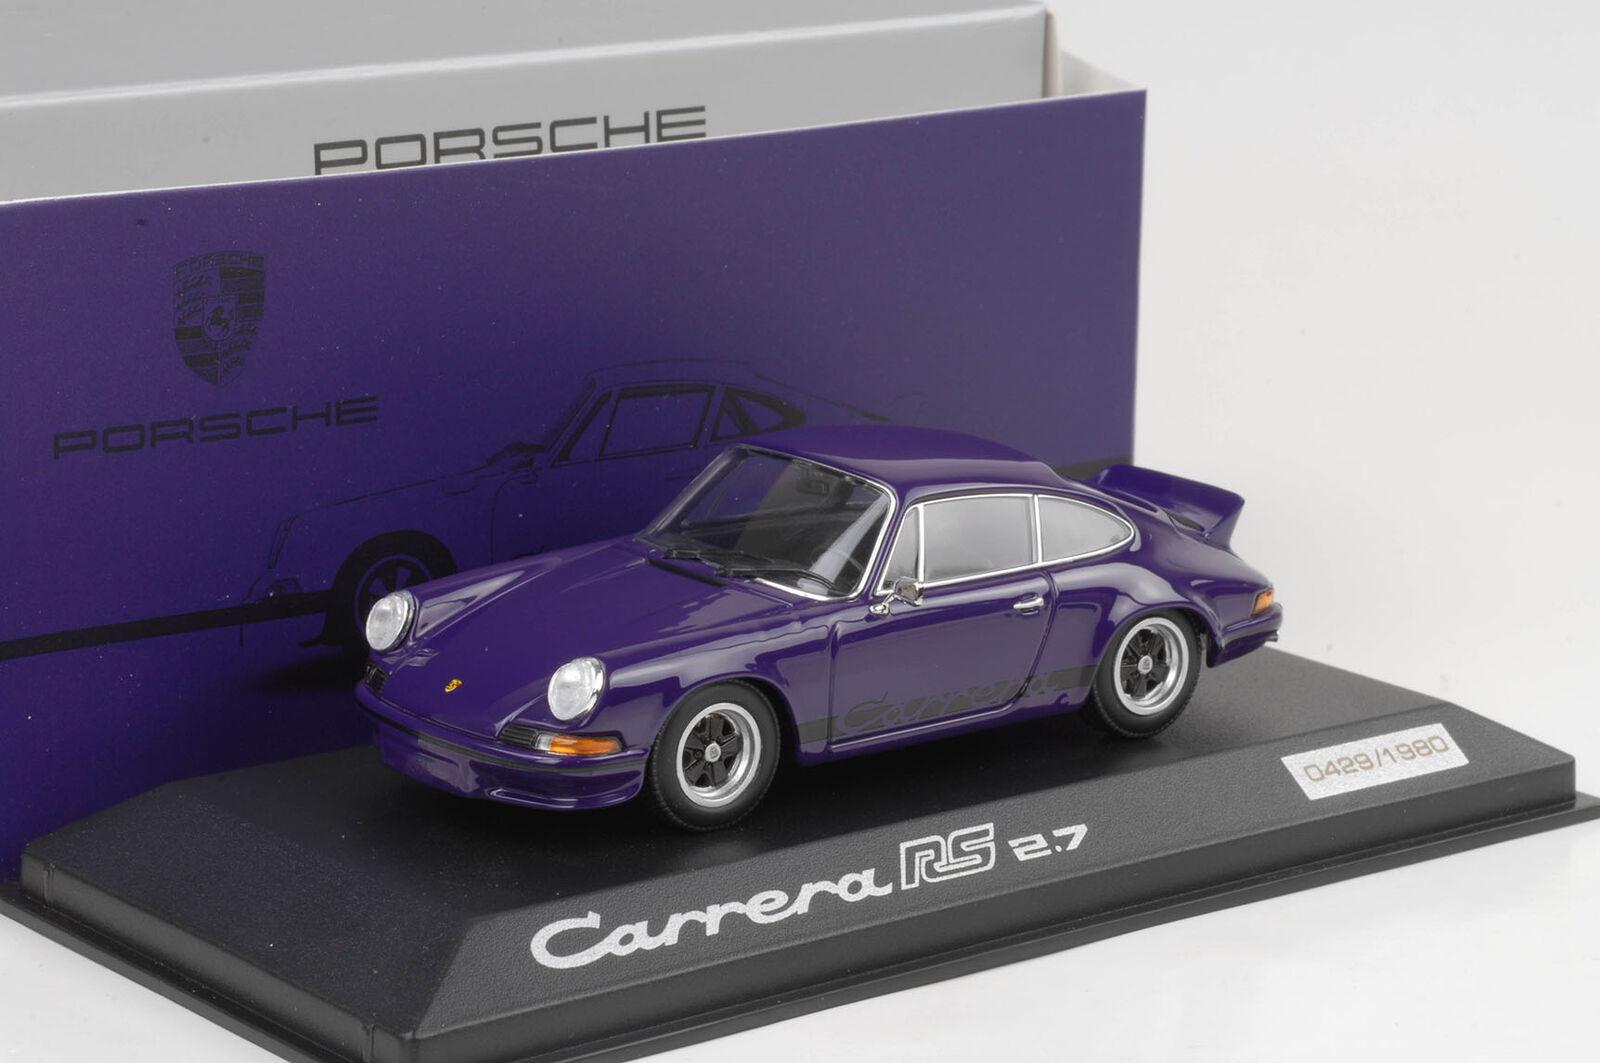 1973 Porsche 911 bilrera R 2.7 Mauve svkonsts Policies 1 43 Minichamps Wap